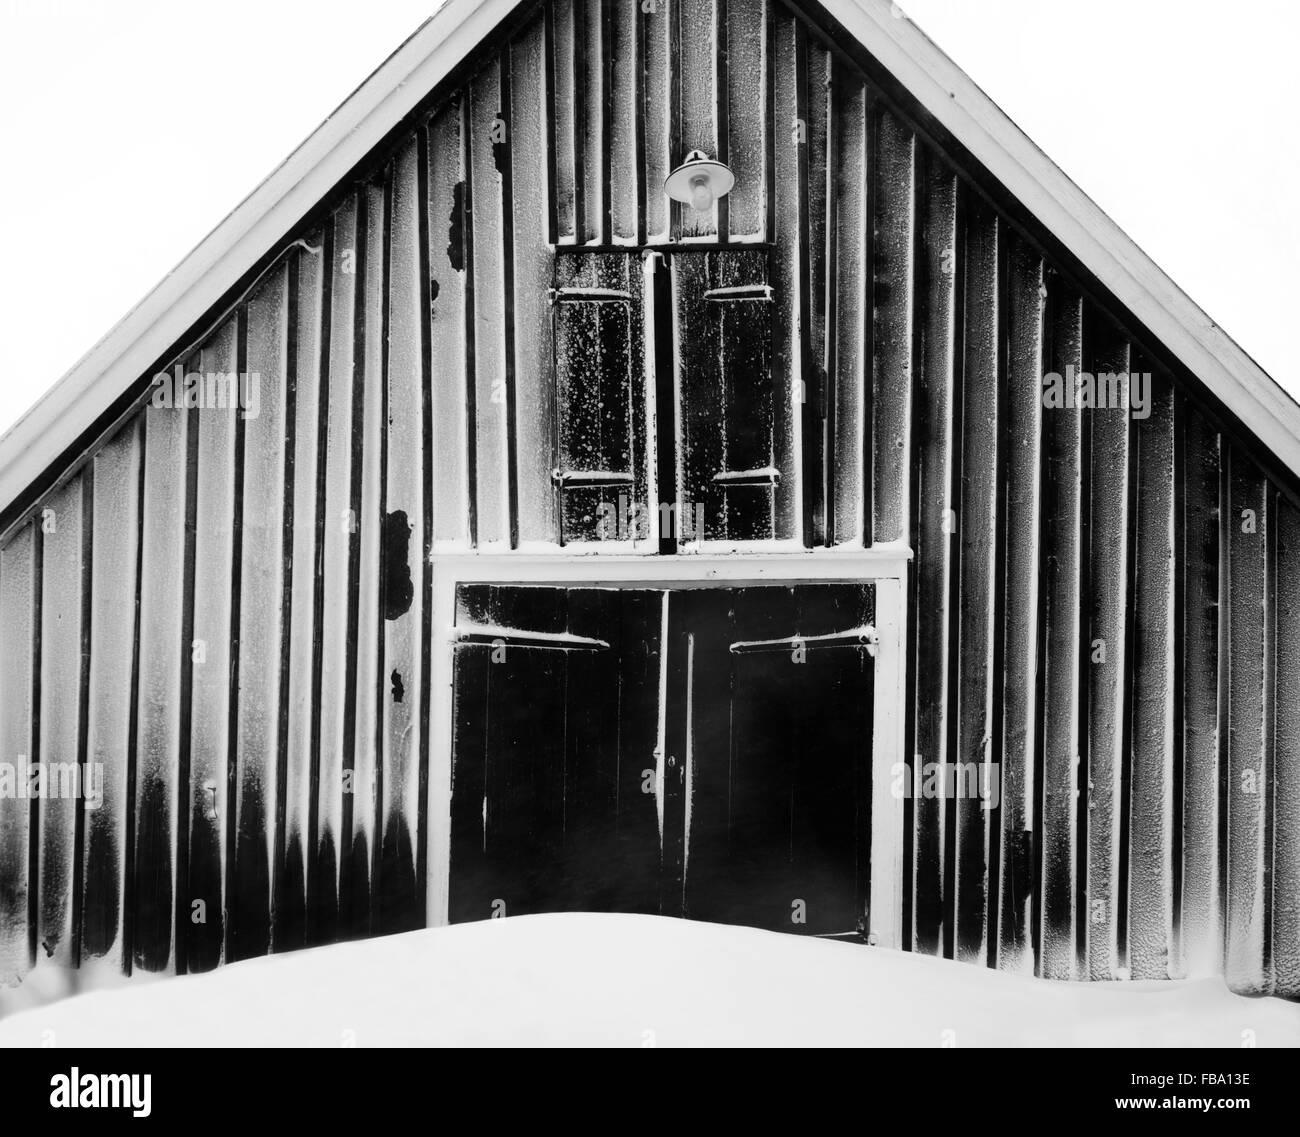 Sweden, Ostergotland, Barn in winter - Stock Image